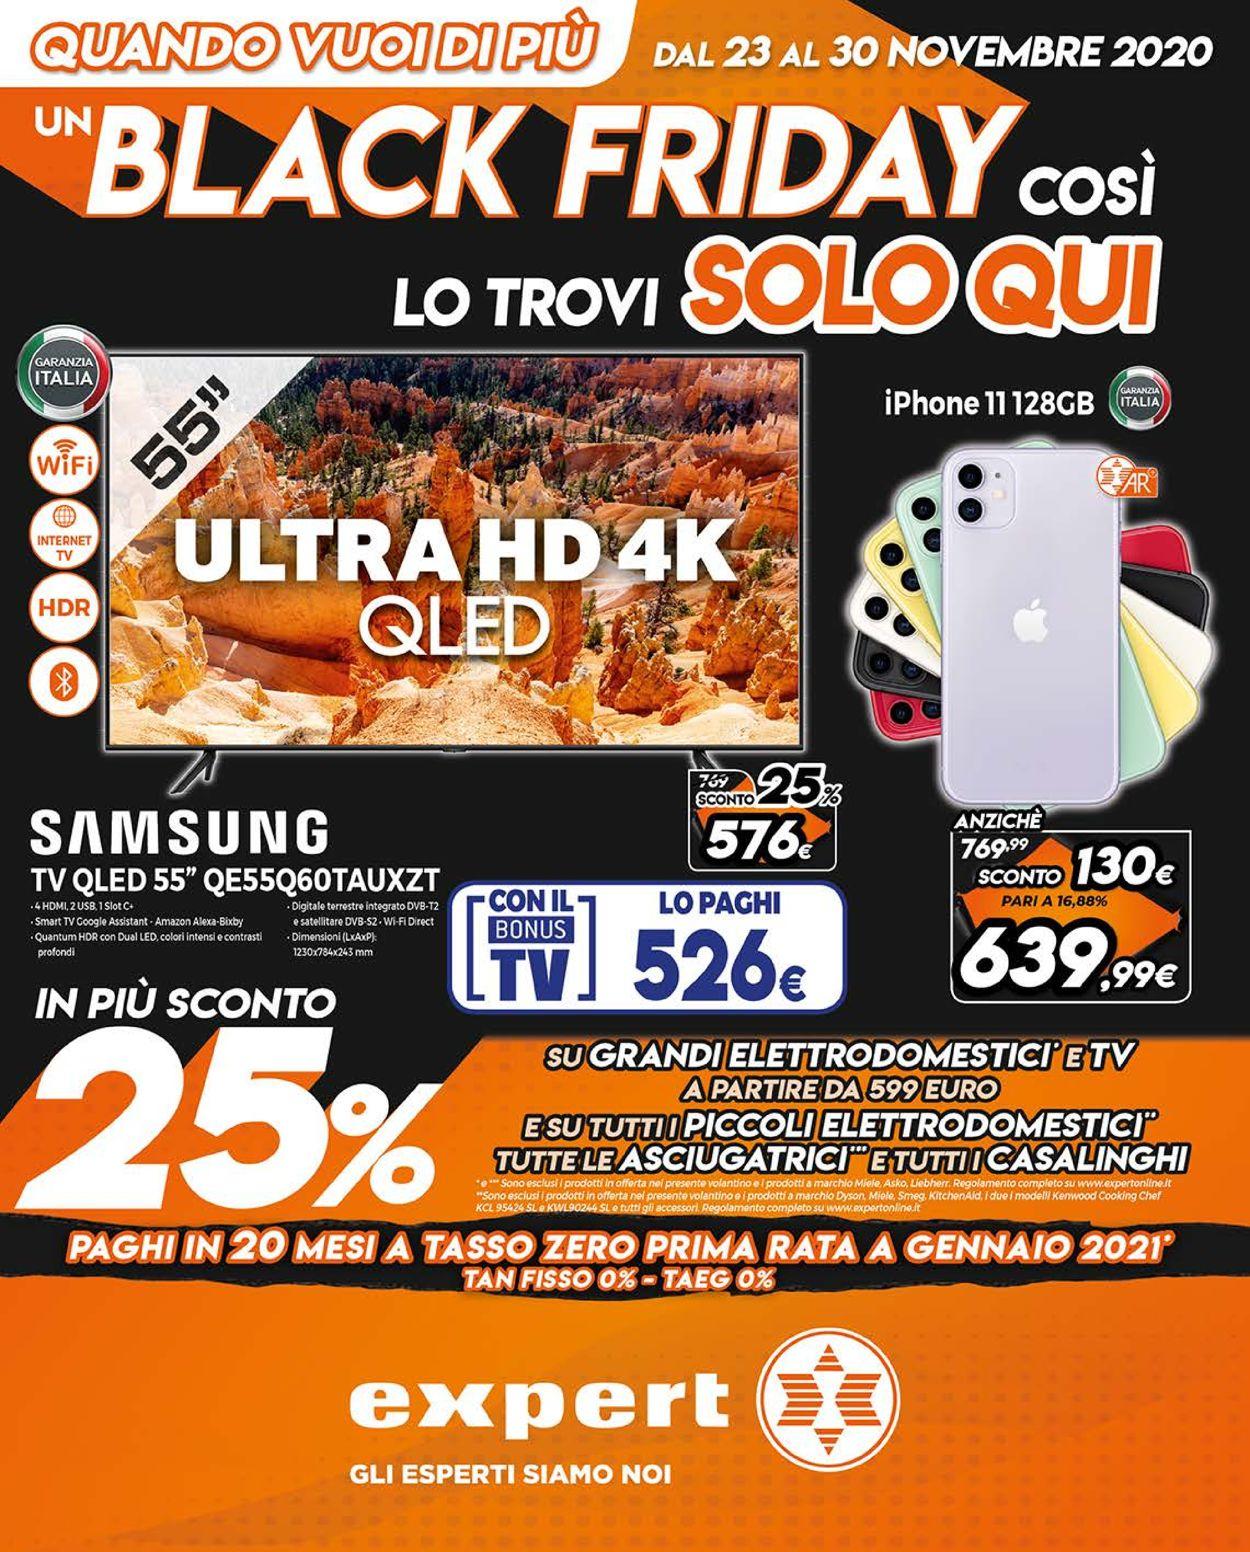 Volantino Expert - Black Friday 2020 - Offerte 23/11-30/11/2020